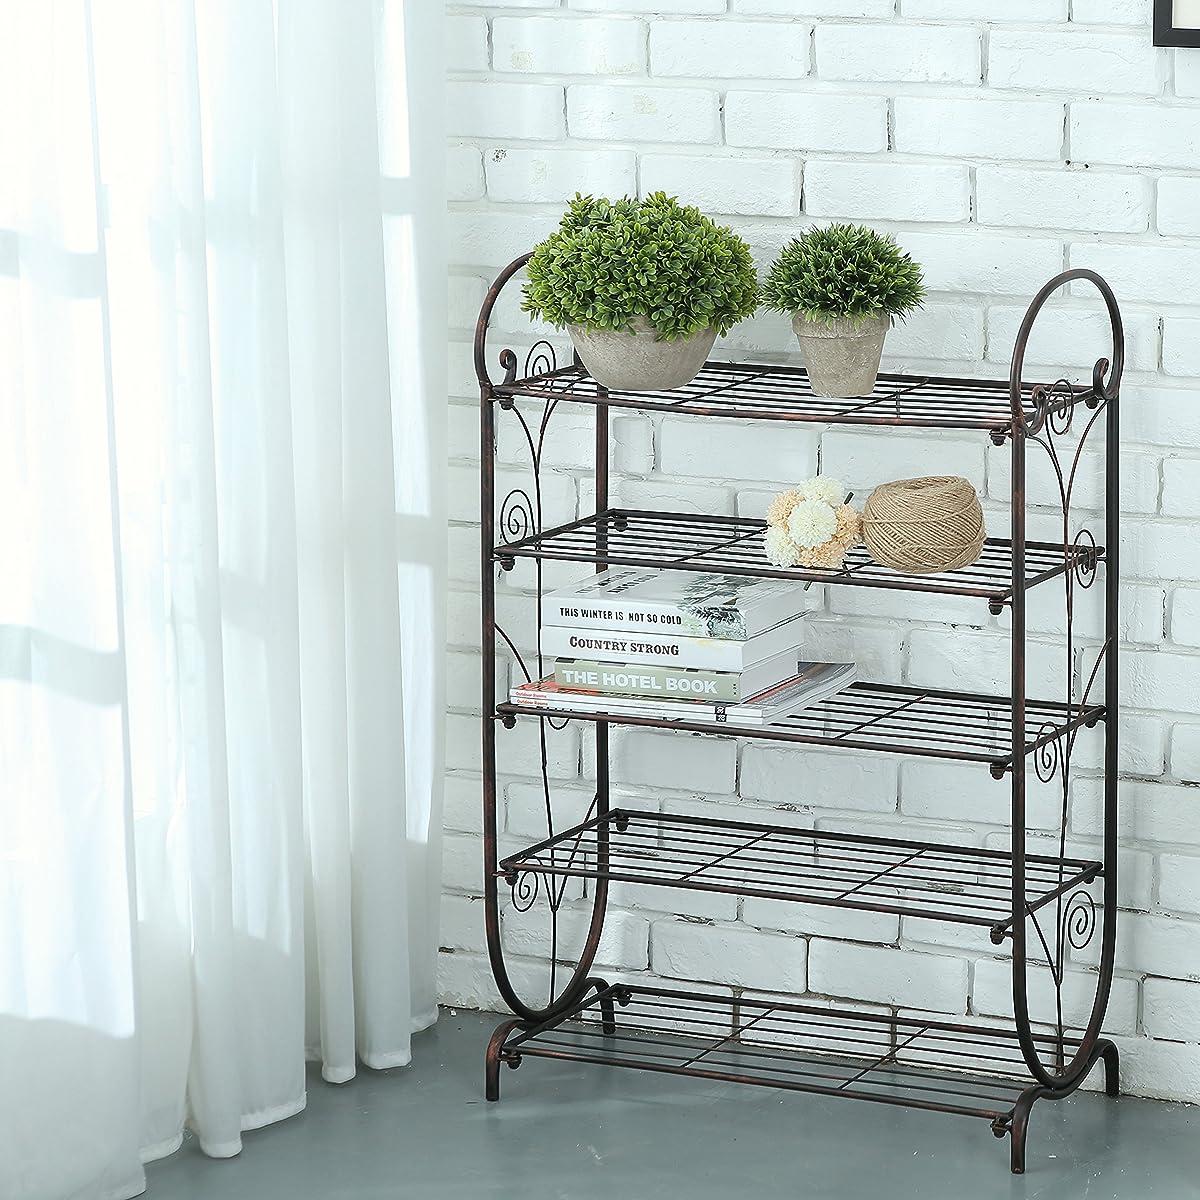 5-Tier Bronze Swirl Design Freestanding Metal Shoe Rack Storage and Organizer Shelf